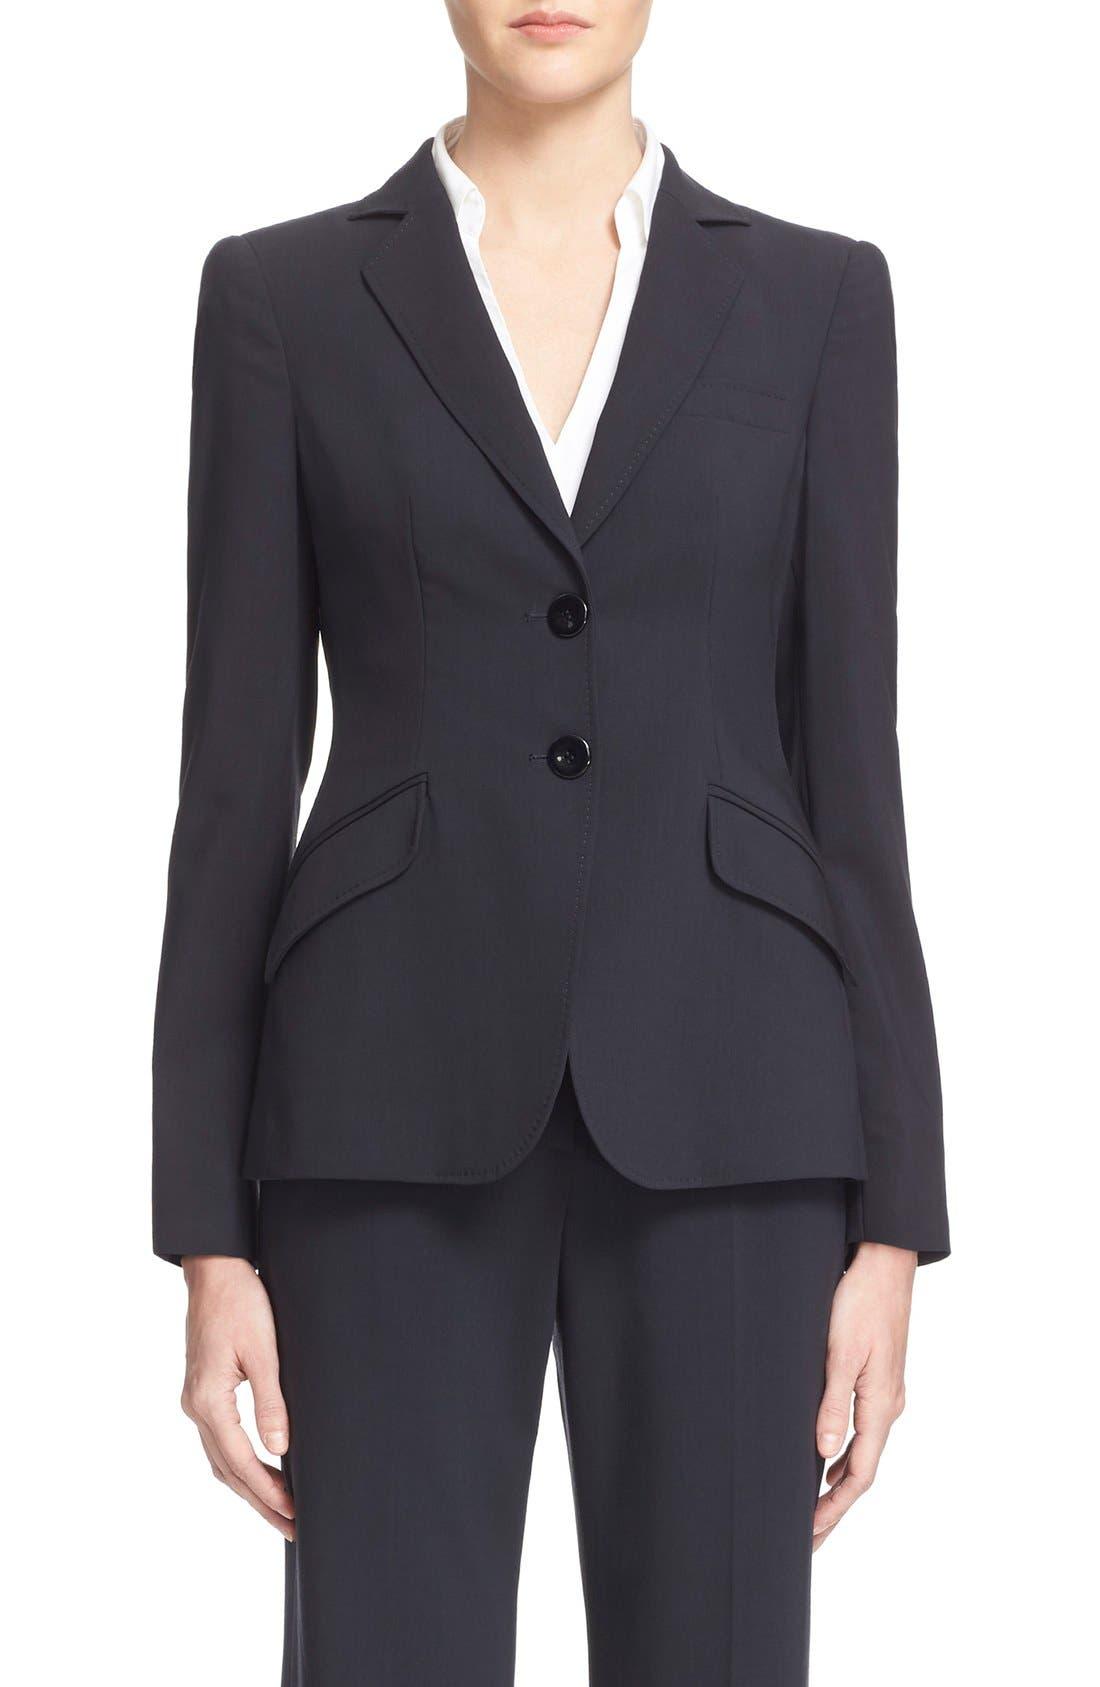 Main Image - Armani Collezioni Two-Button Featherweight Wool Jacket